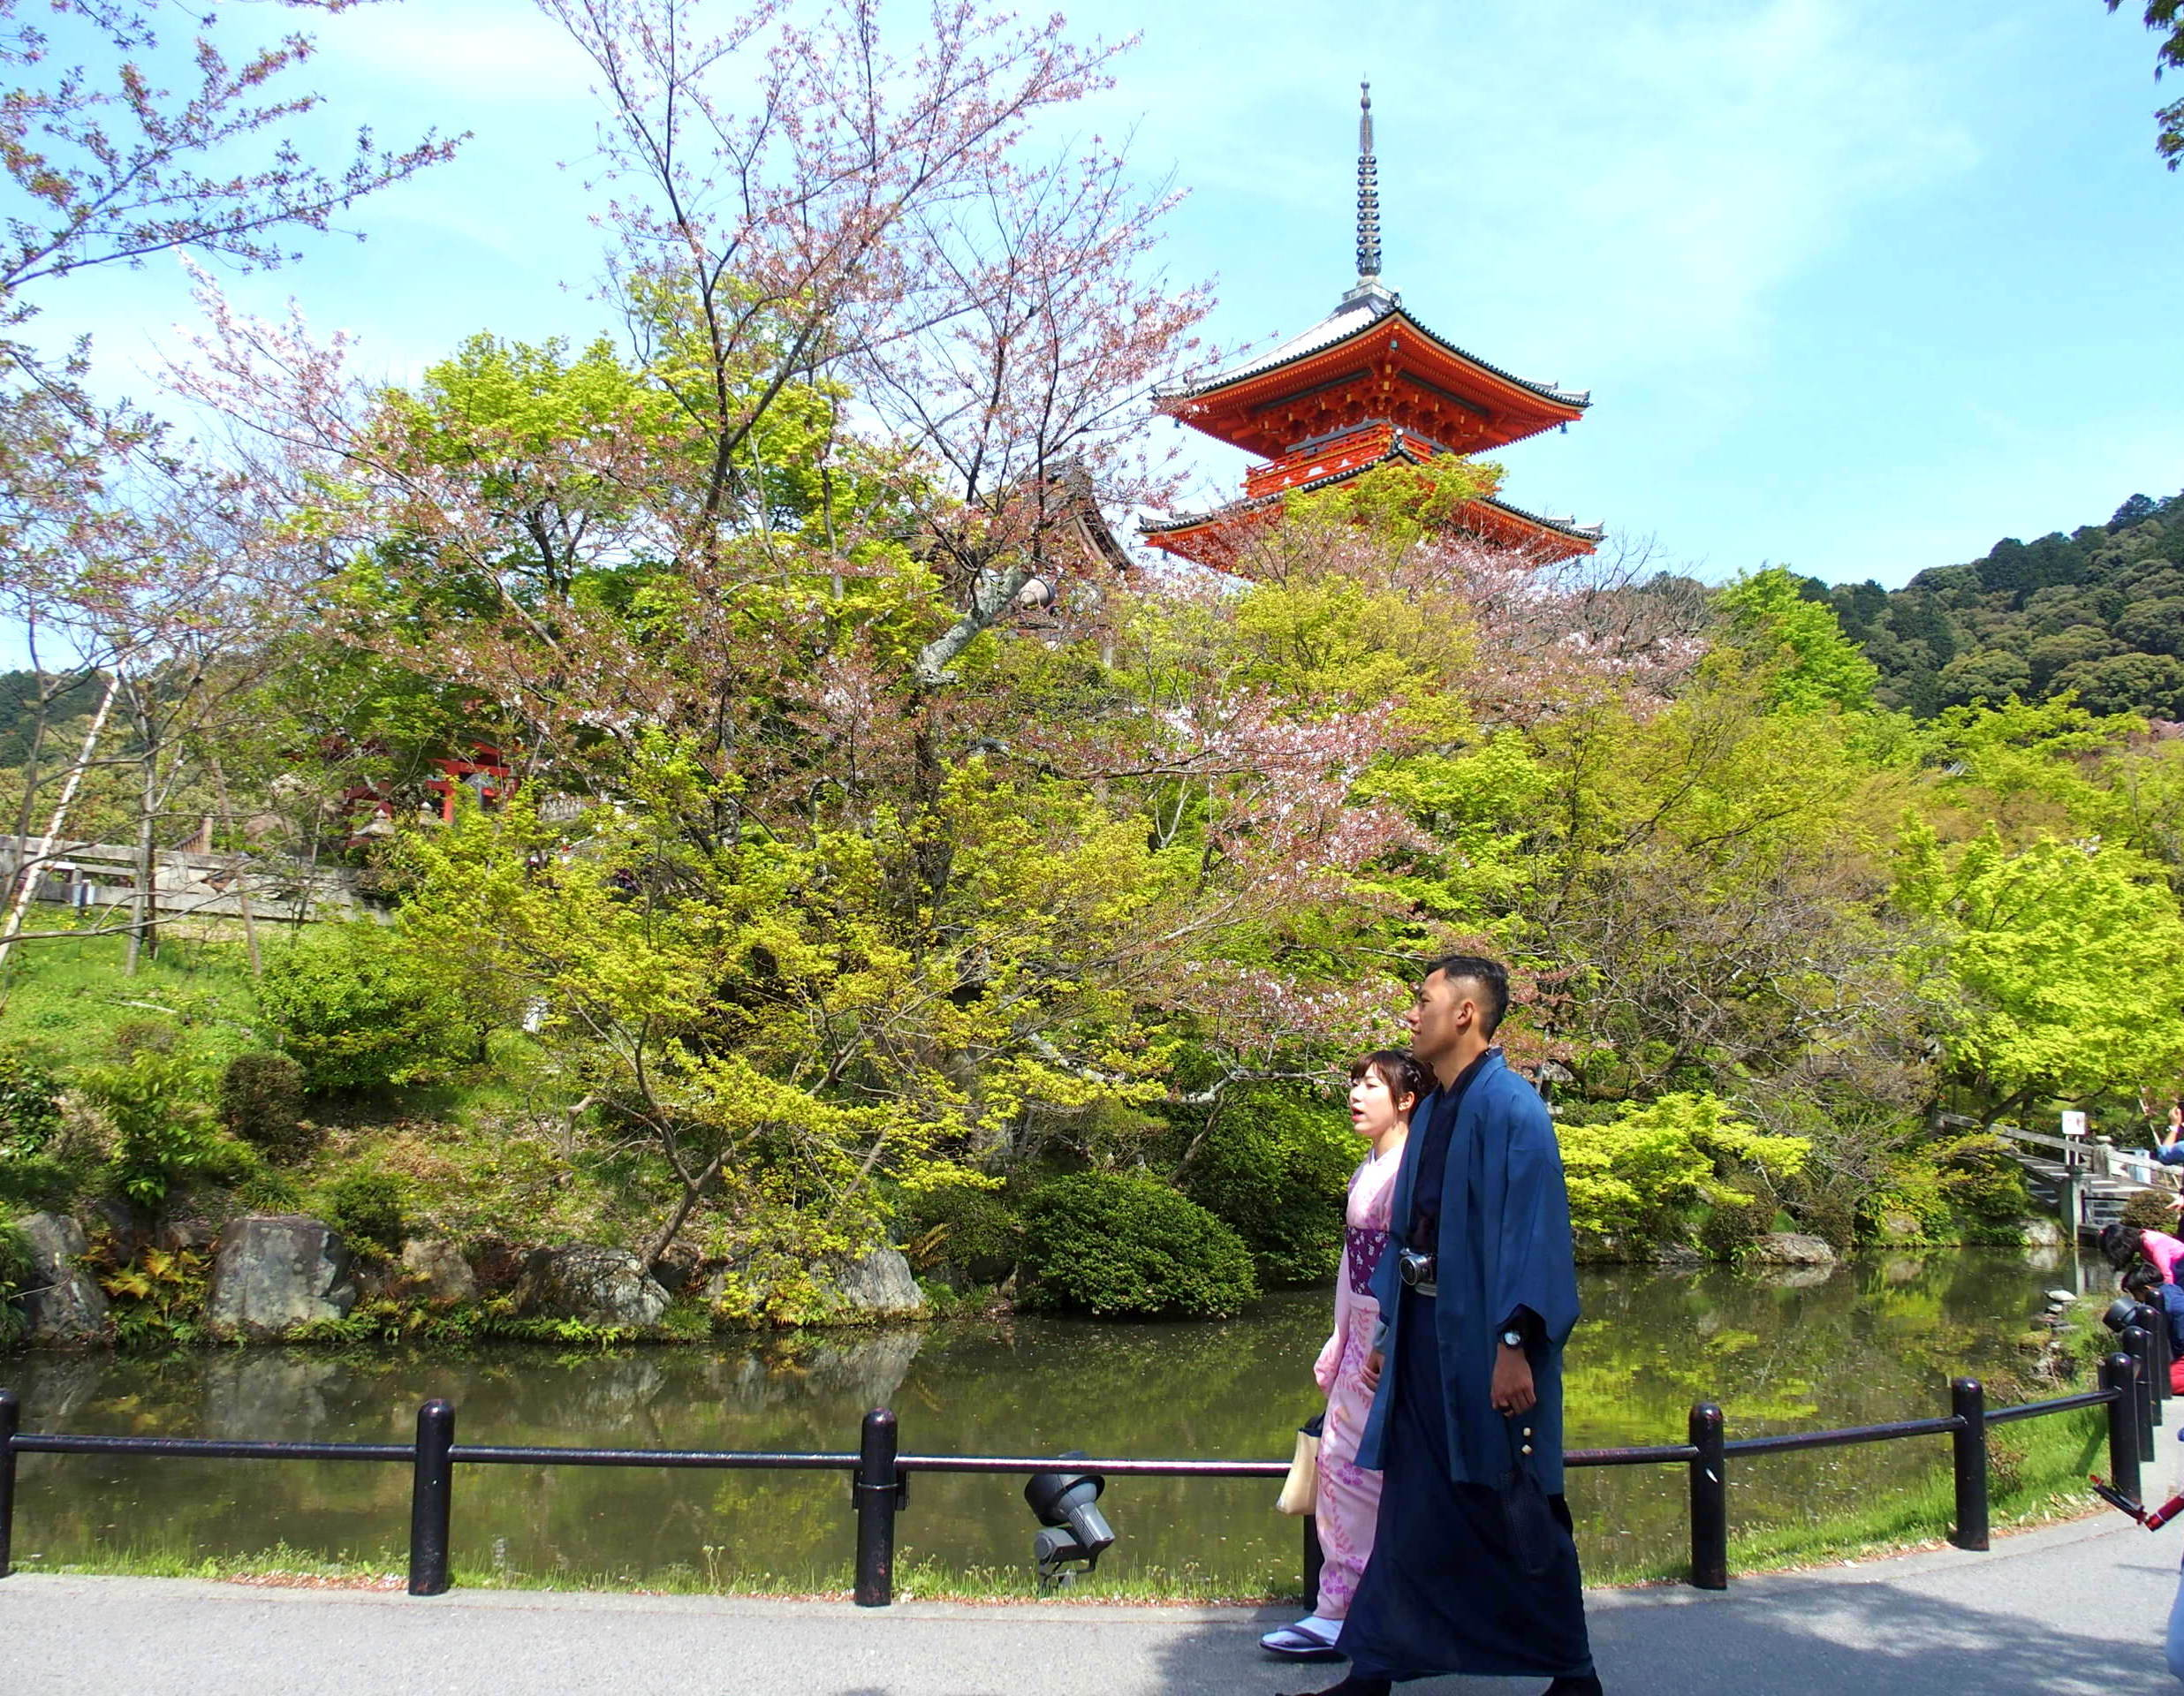 Dans les jardins du temple Kiyomizu-Dera Kyoto